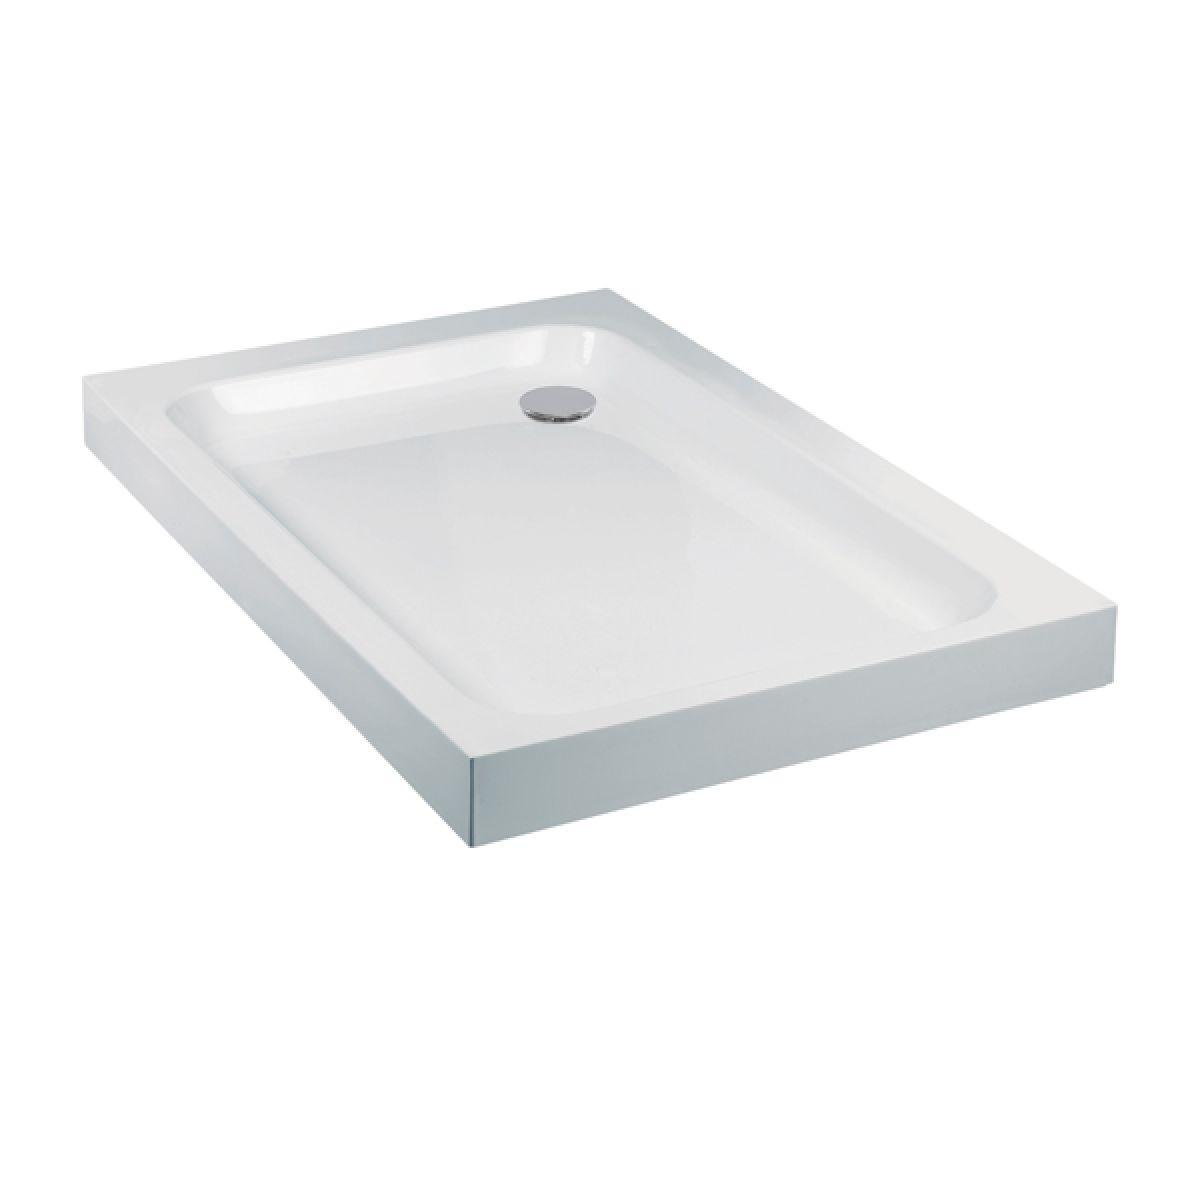 Frontline Standard Rectanglular Shower Tray 1400 x 800mm